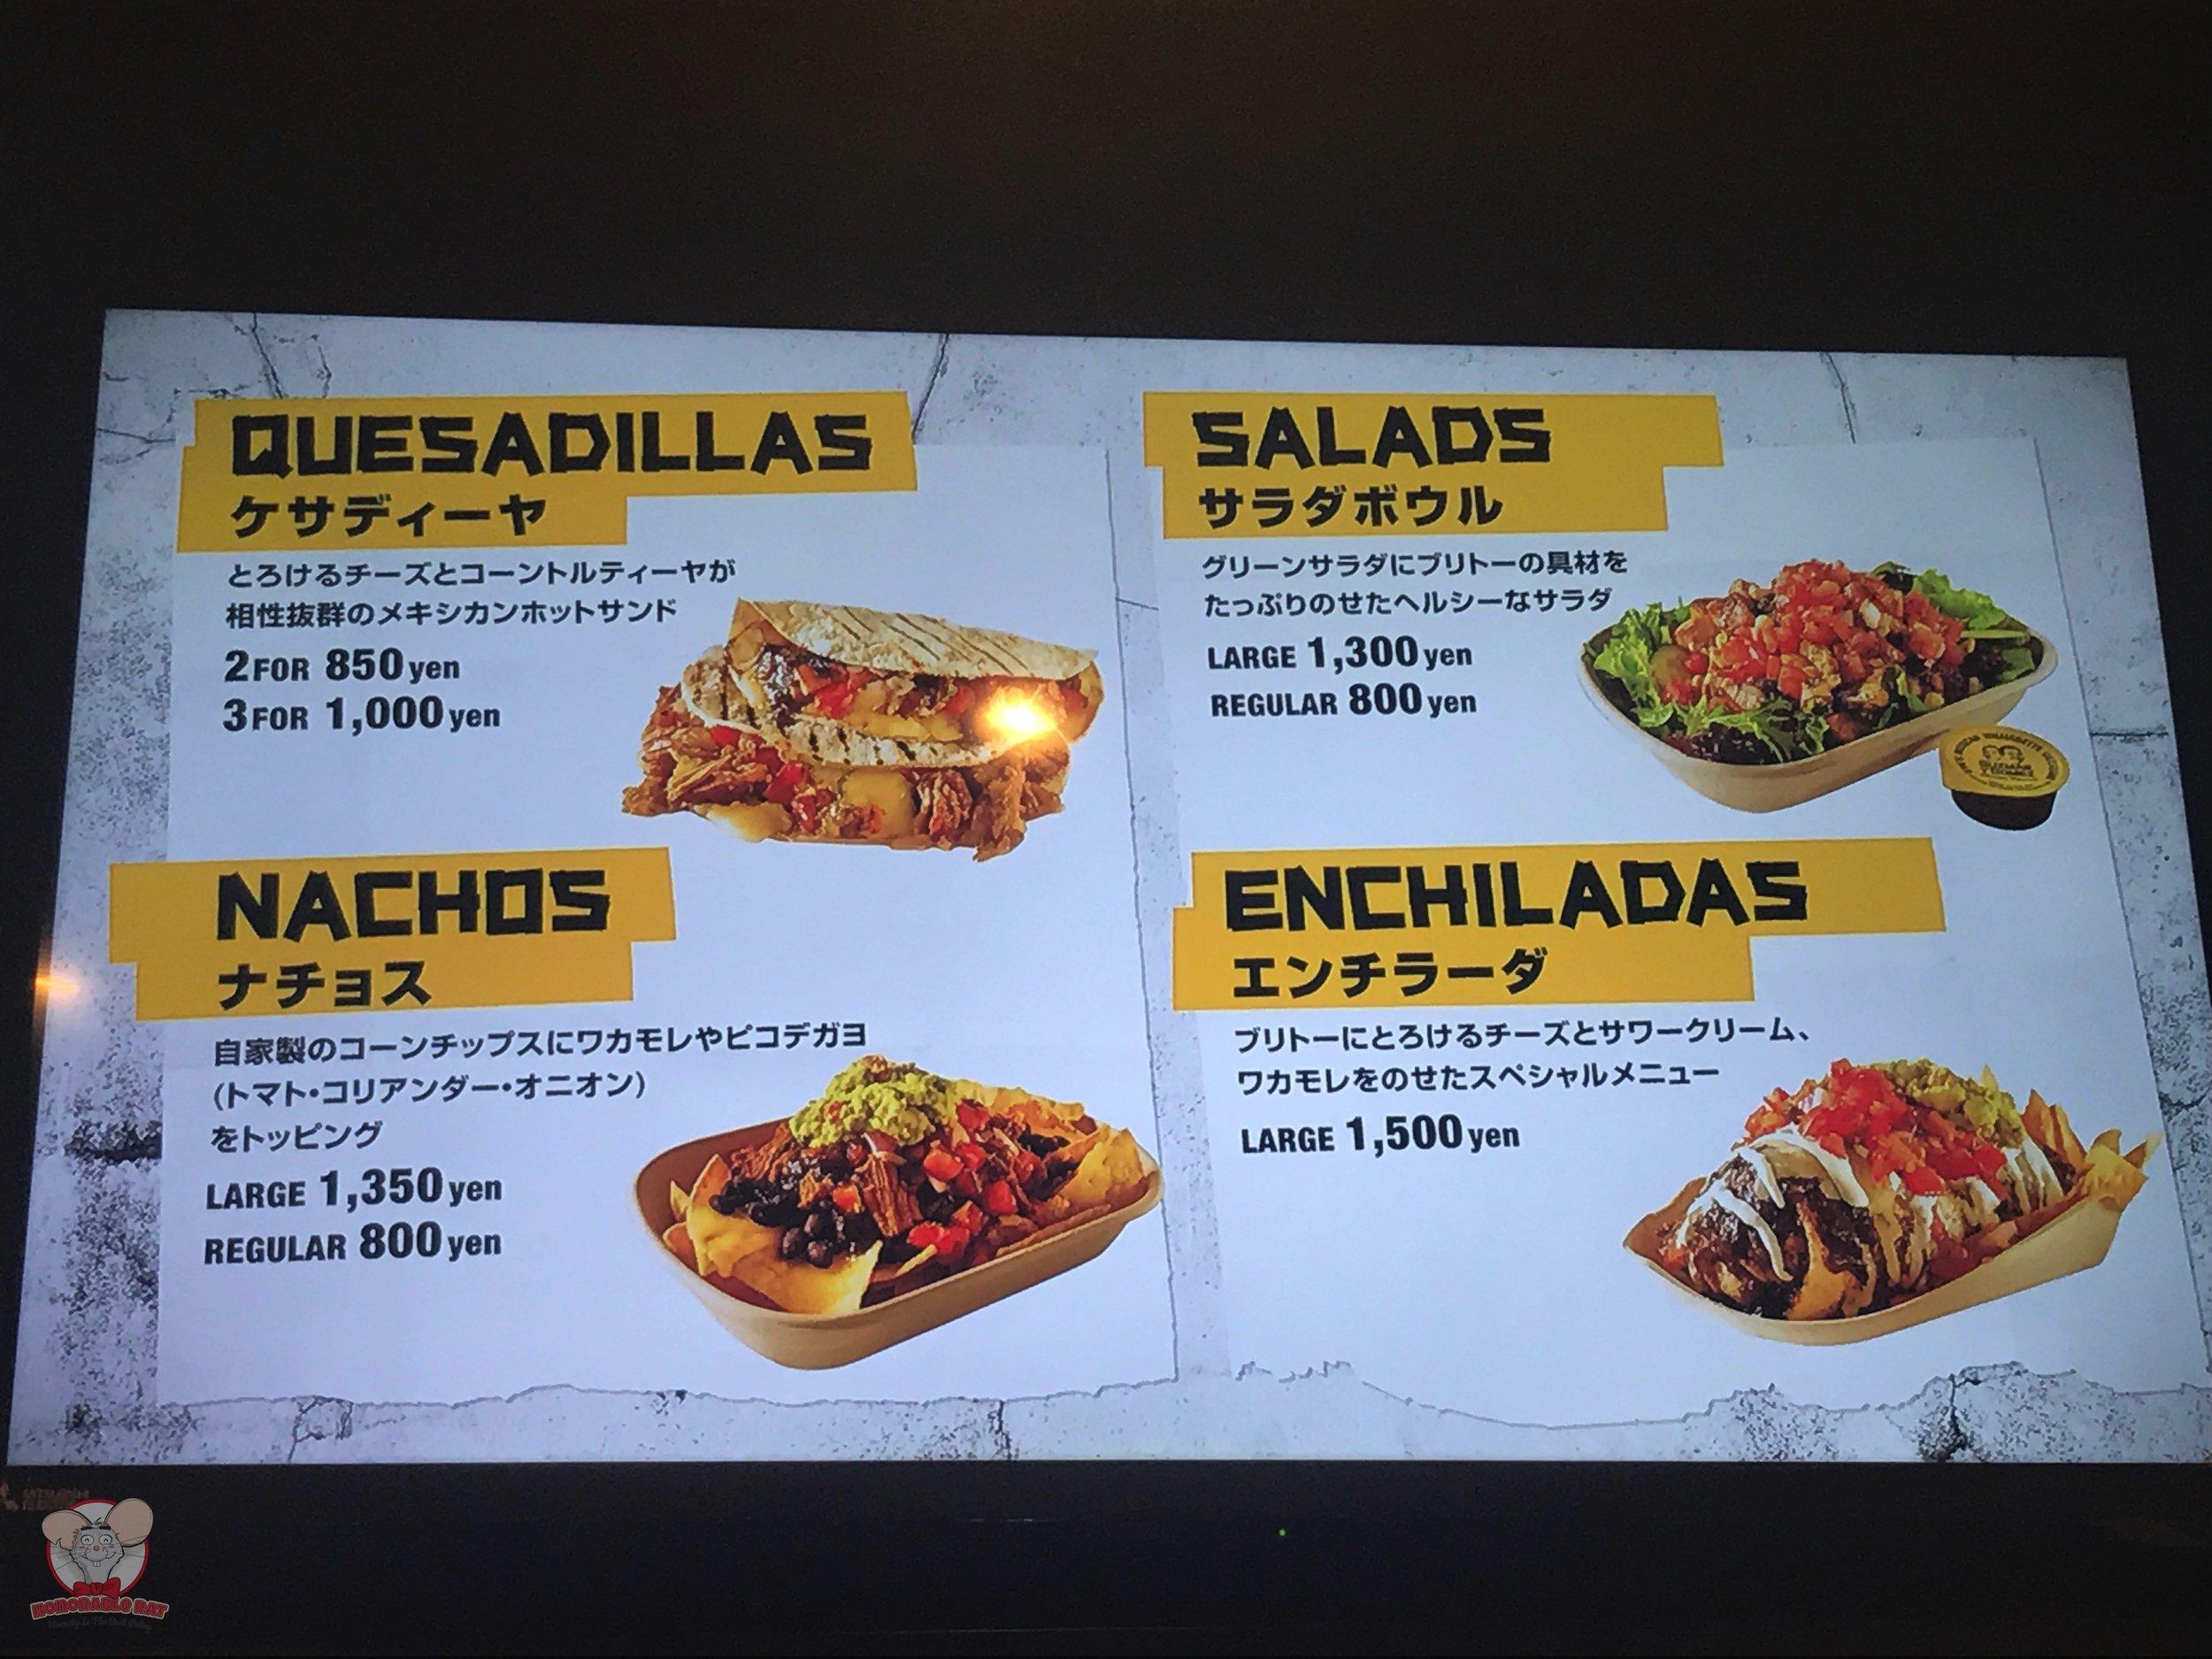 Quesadillas, Nachos, Salads or Enchiladas?